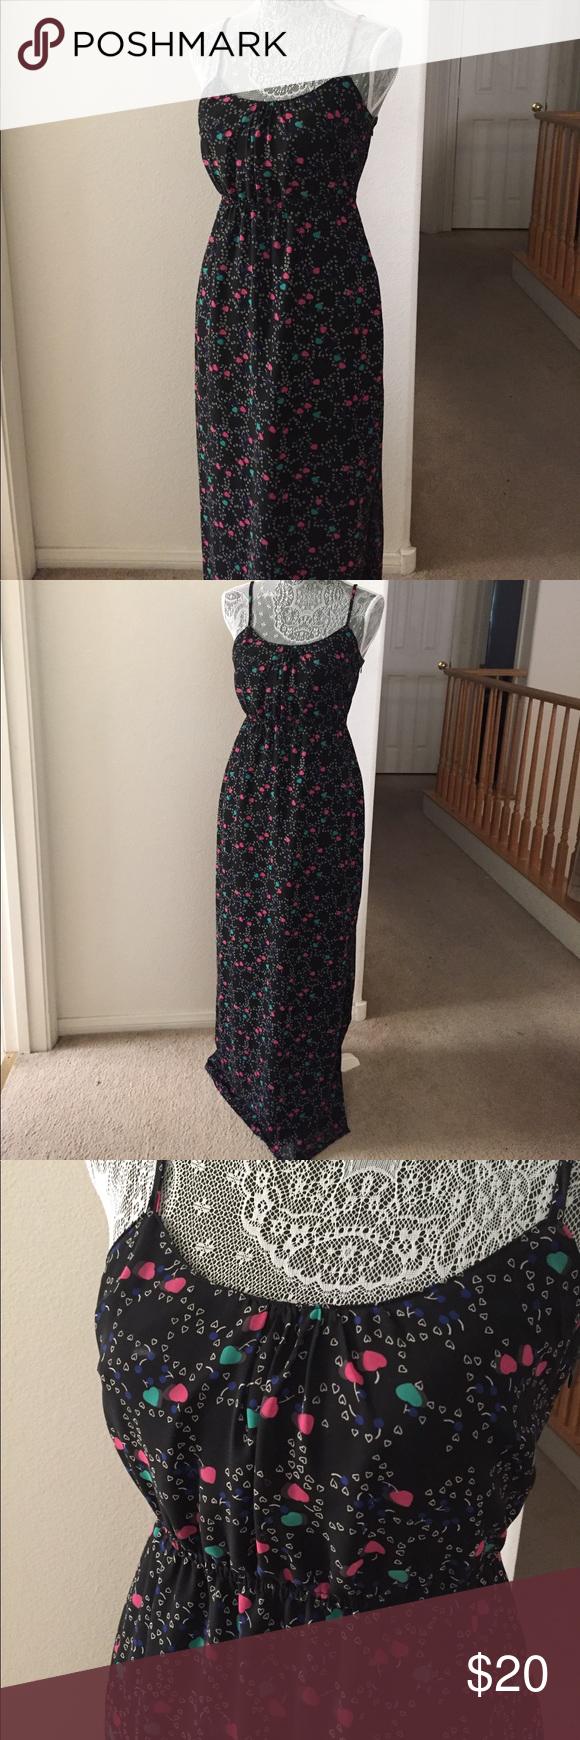 Maxi dress heart print maxi dress has pockets on both sides